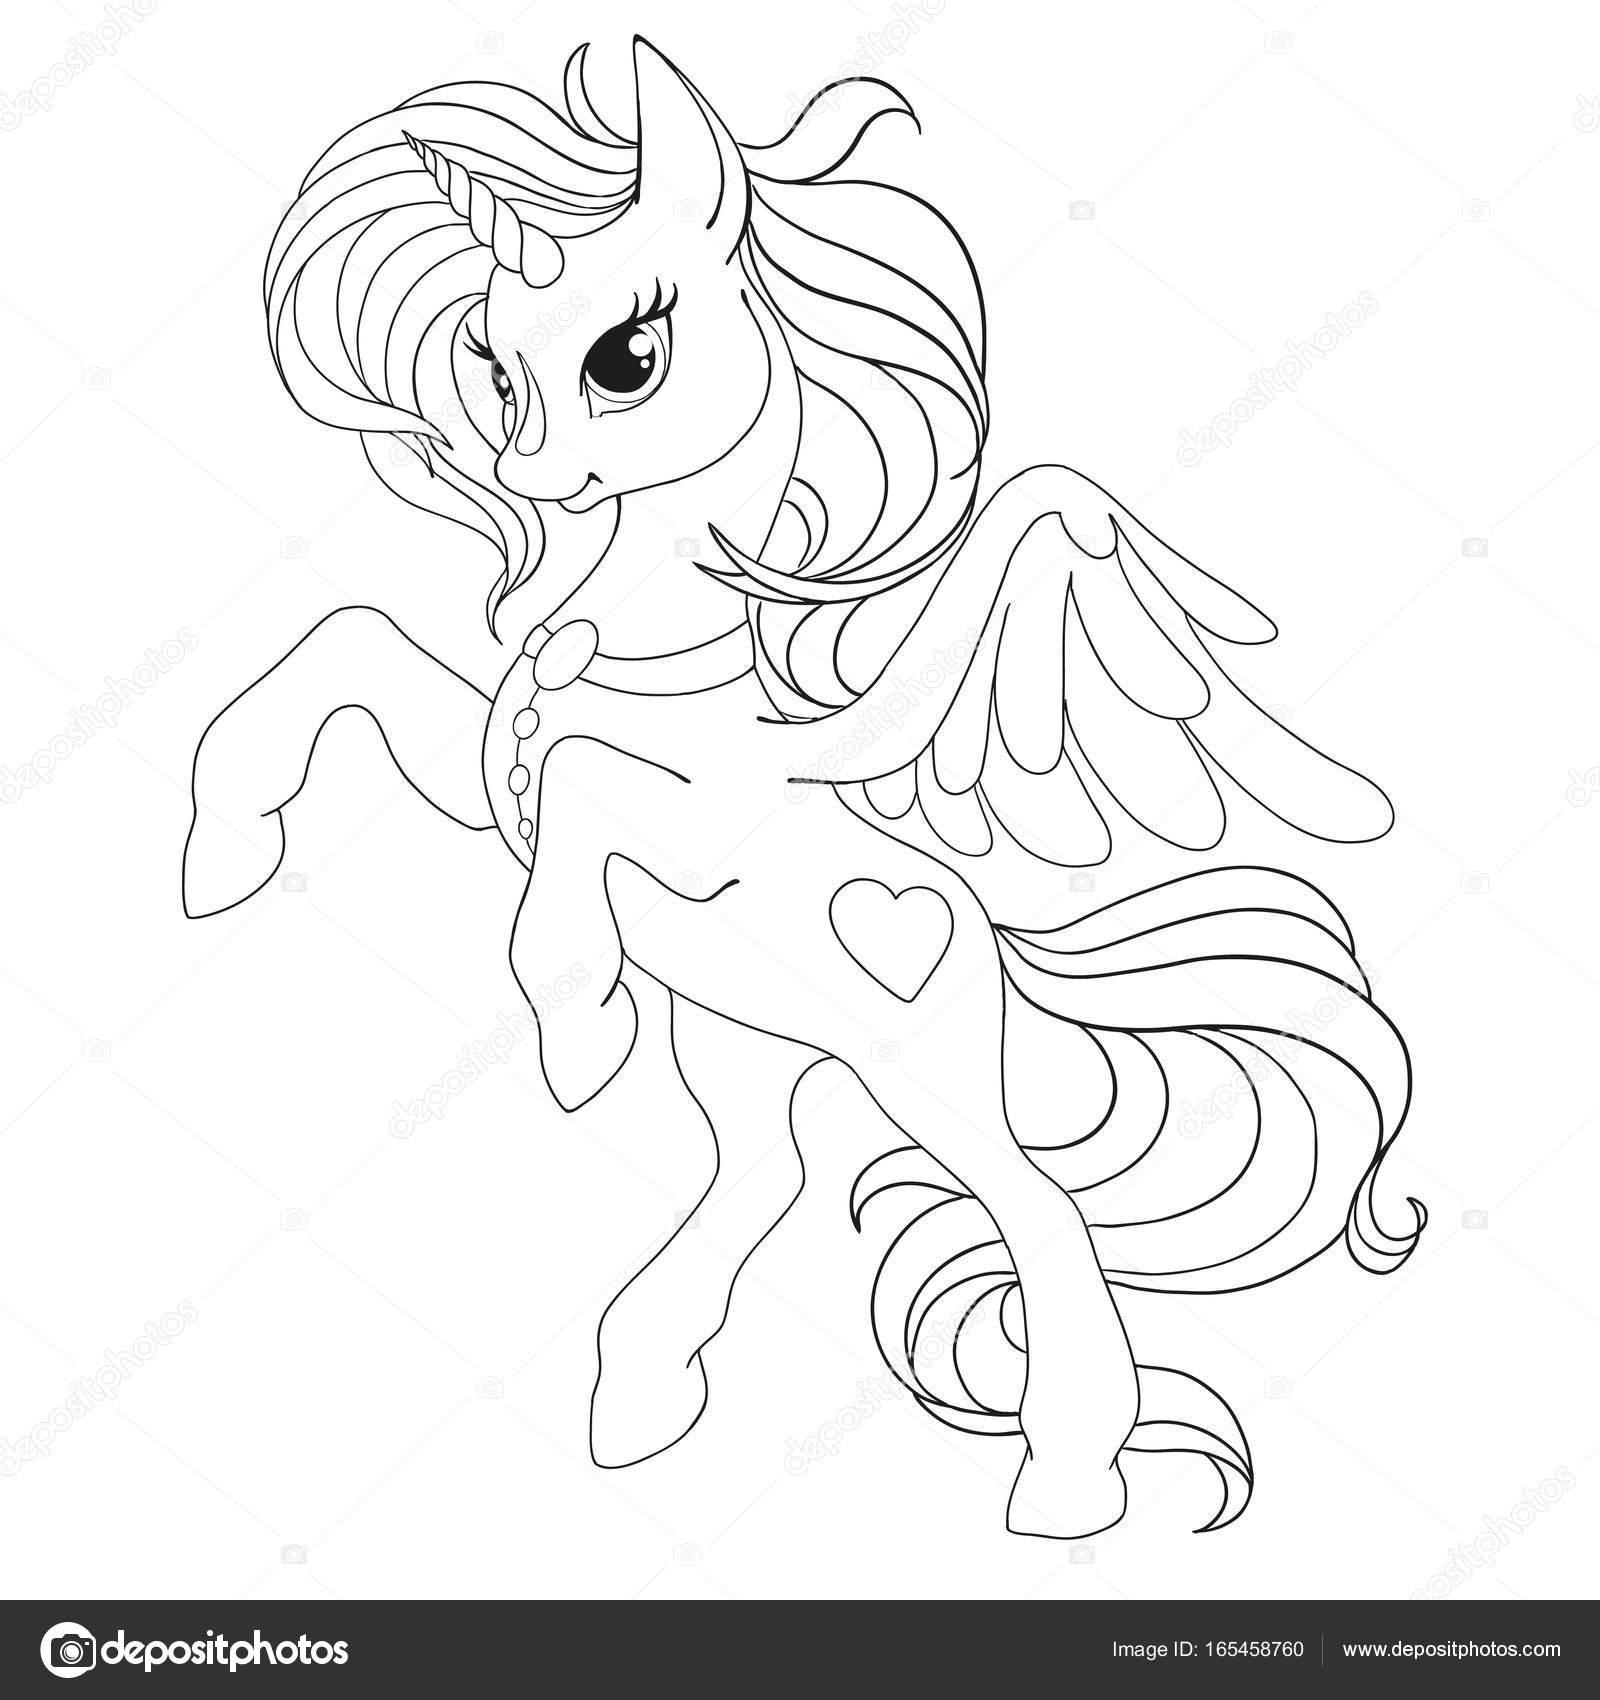 Página Libro Para Colorear Unicornio Fabuloso Caballo Con Alas ...